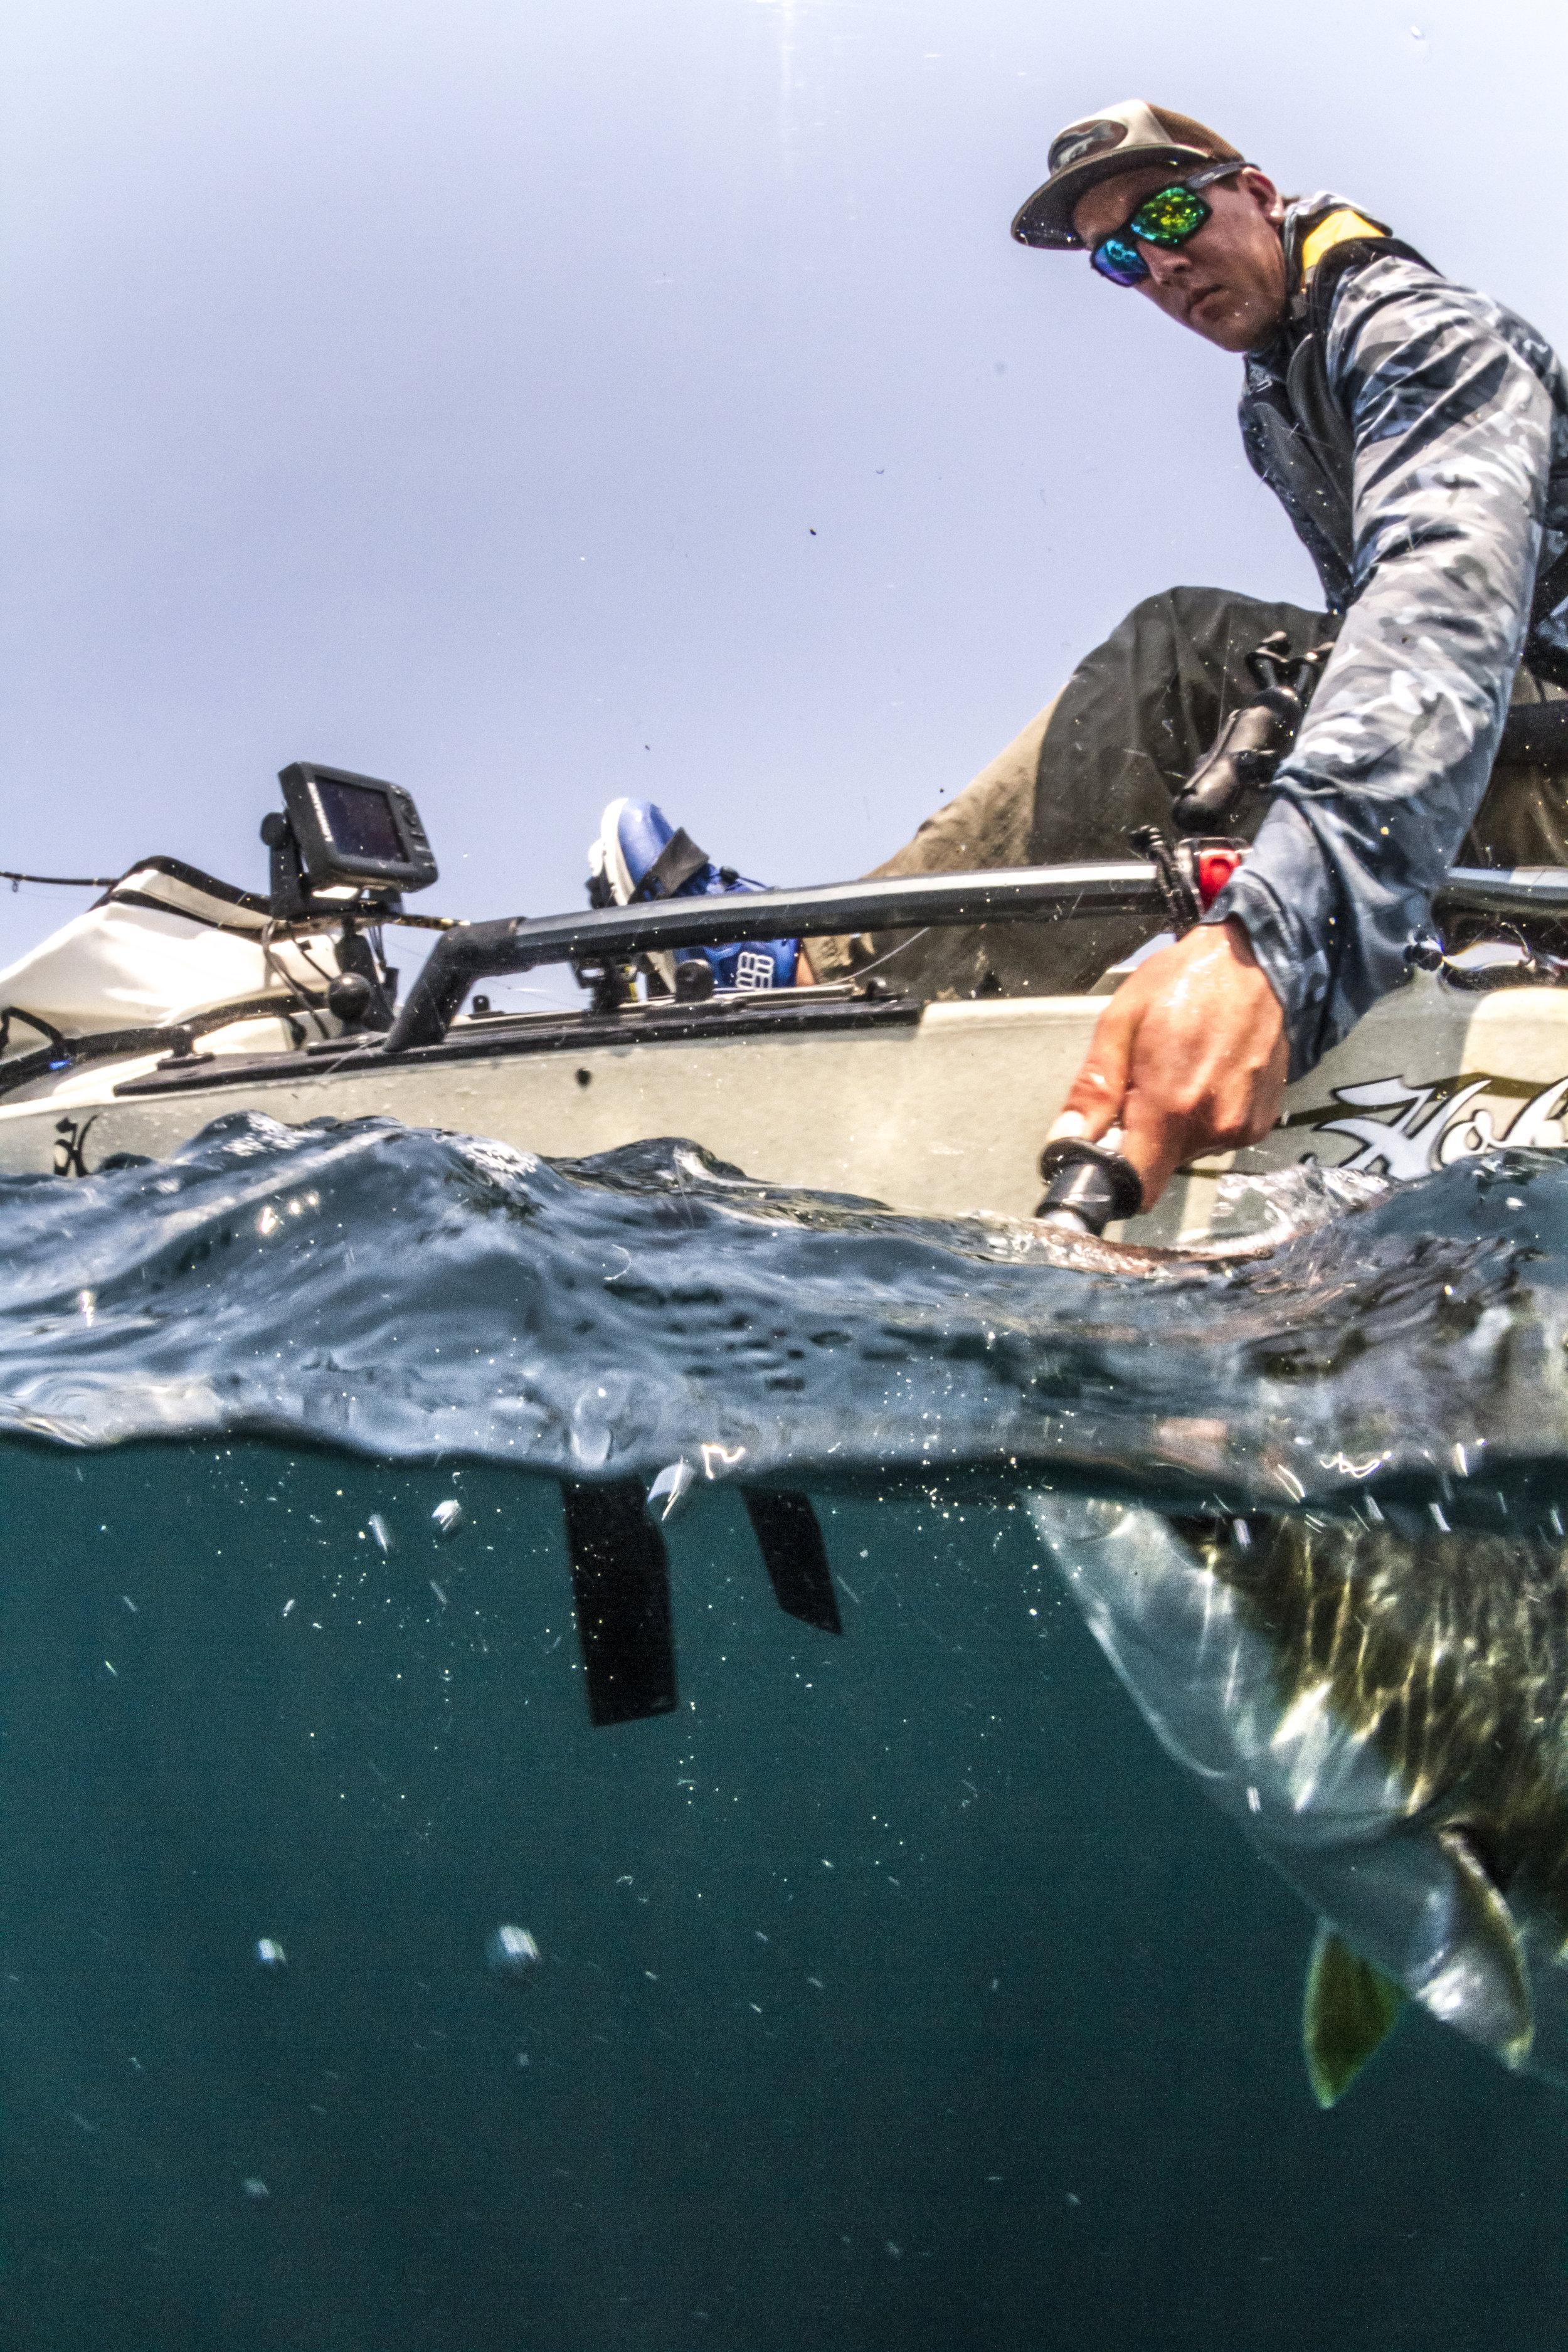 ProAngler14-action-fishing-overUnder-MD180-yellowtail-4408-full.jpg